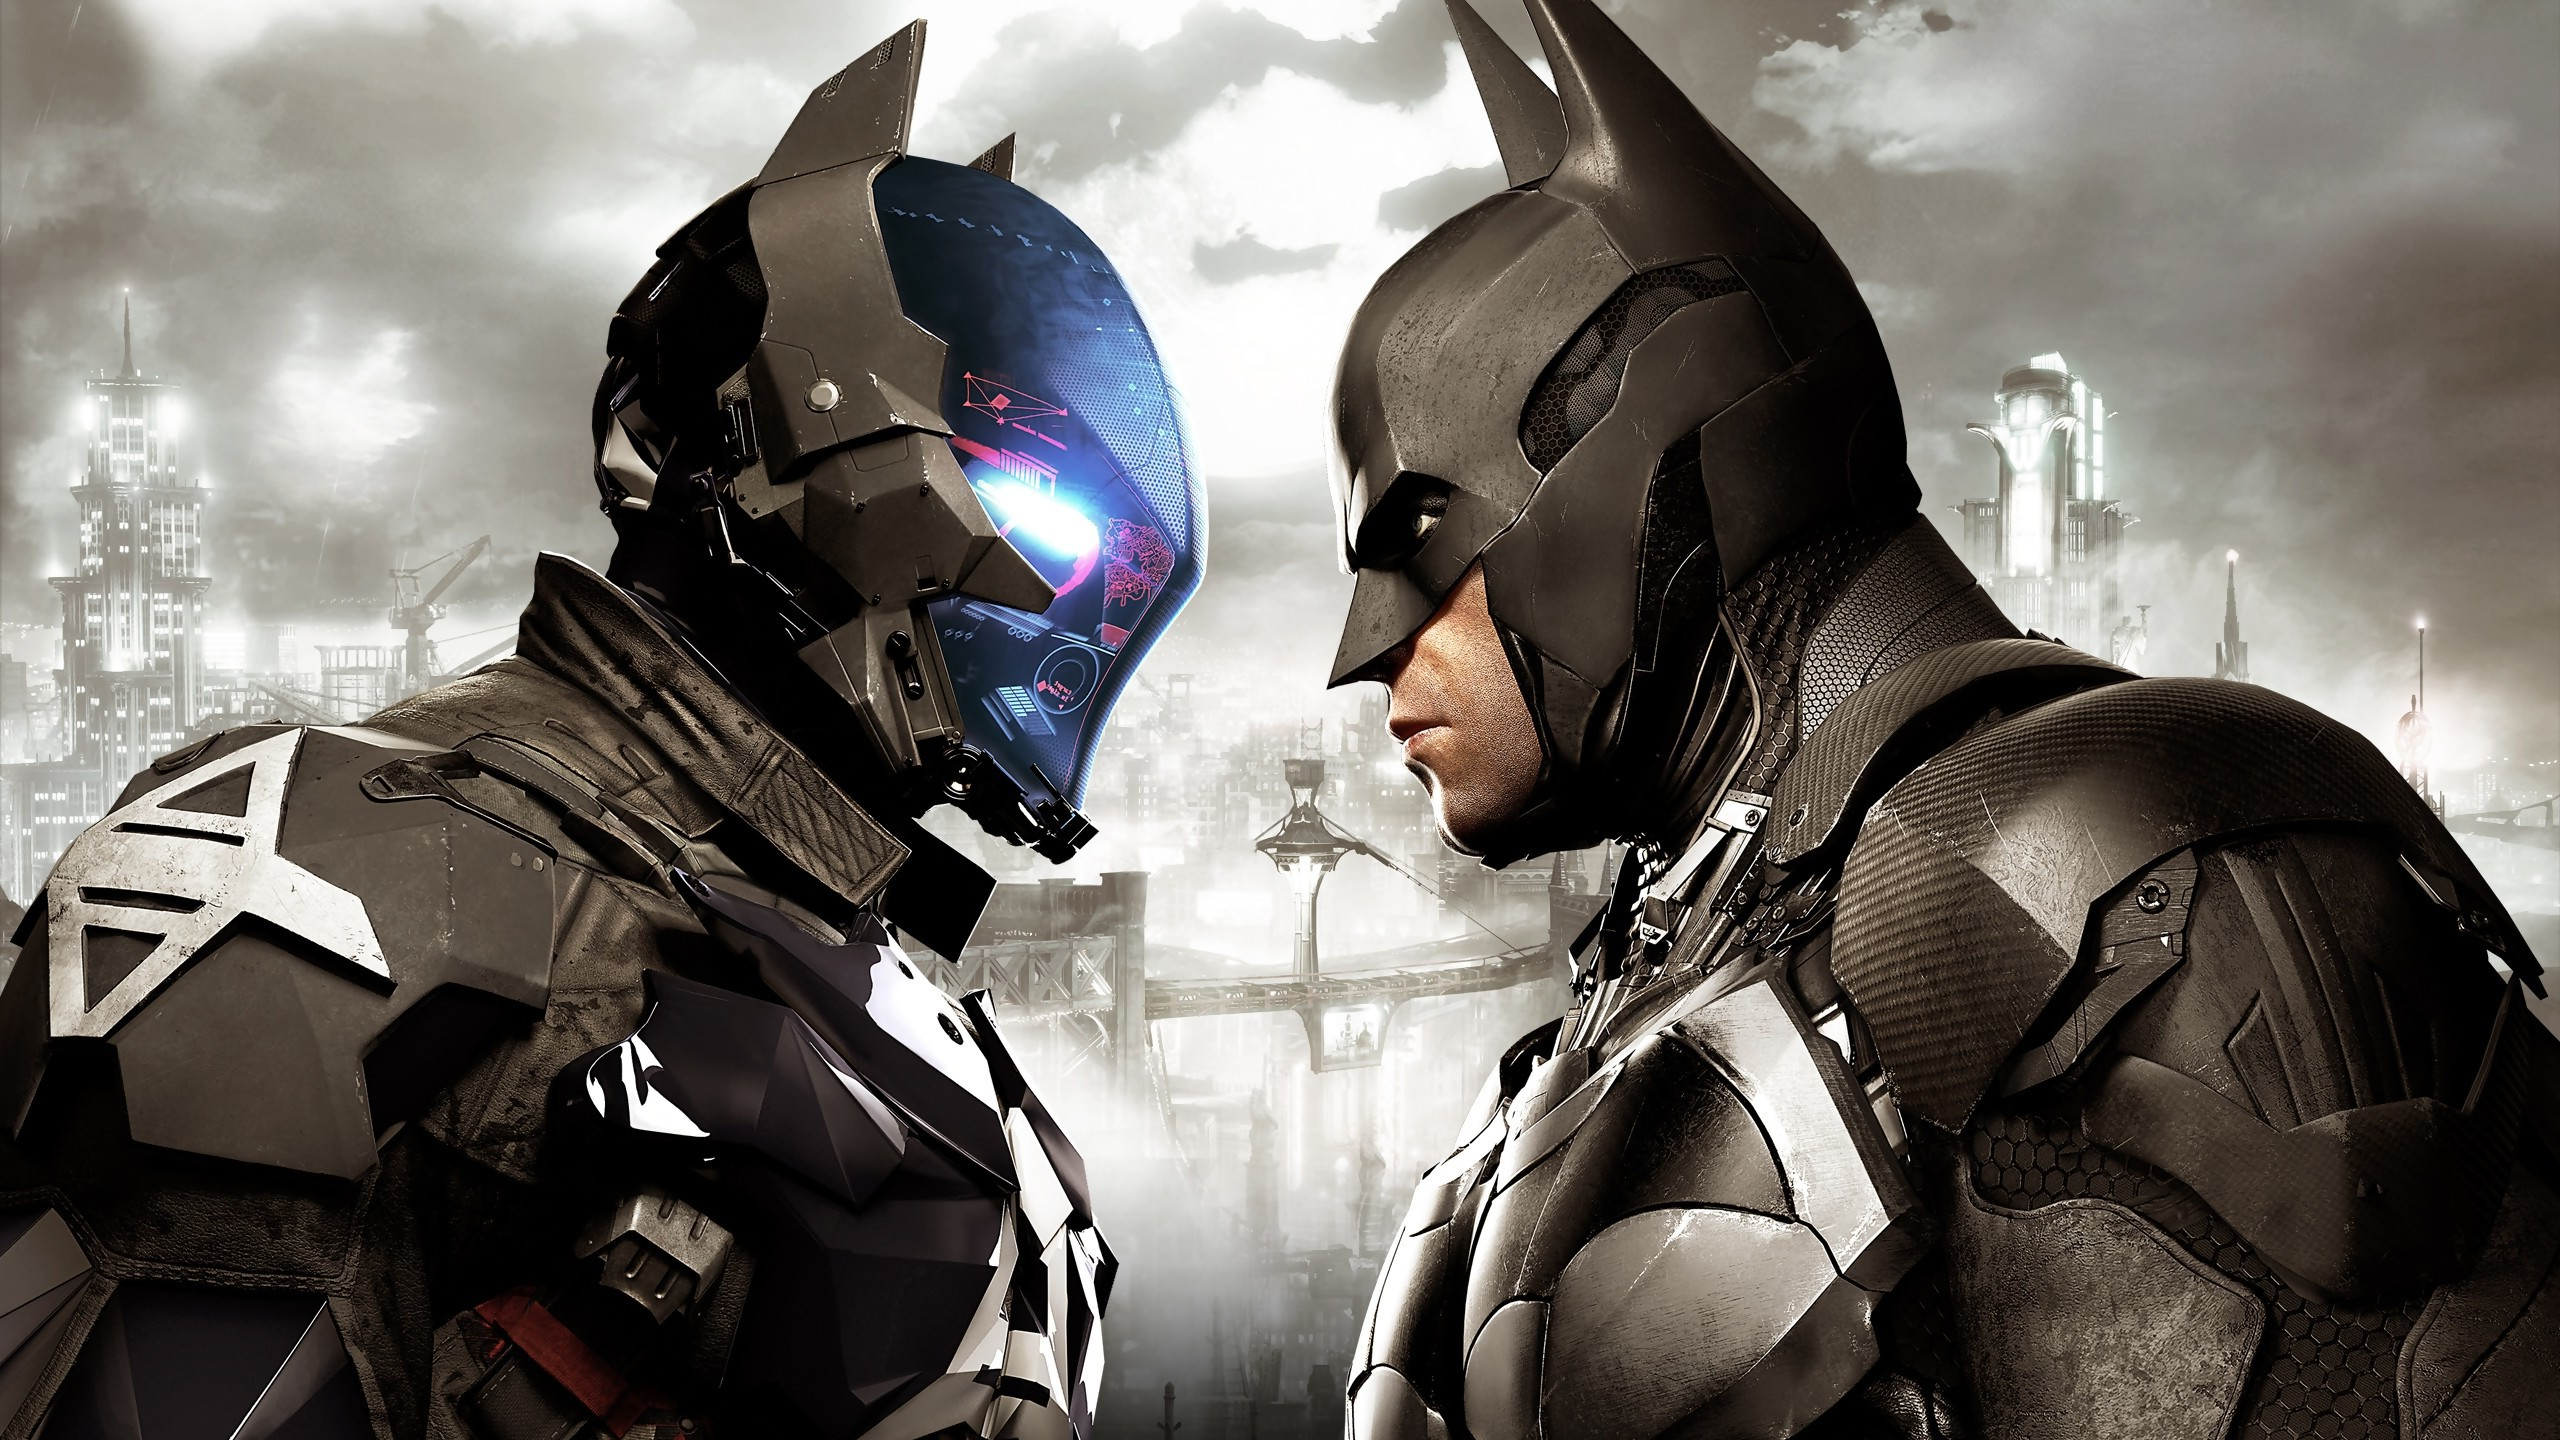 Batman Arkham Knight 2015 Video Game 4k Hd Desktop: Batman Arkham Knight 2015, HD Games, 4k Wallpapers, Images